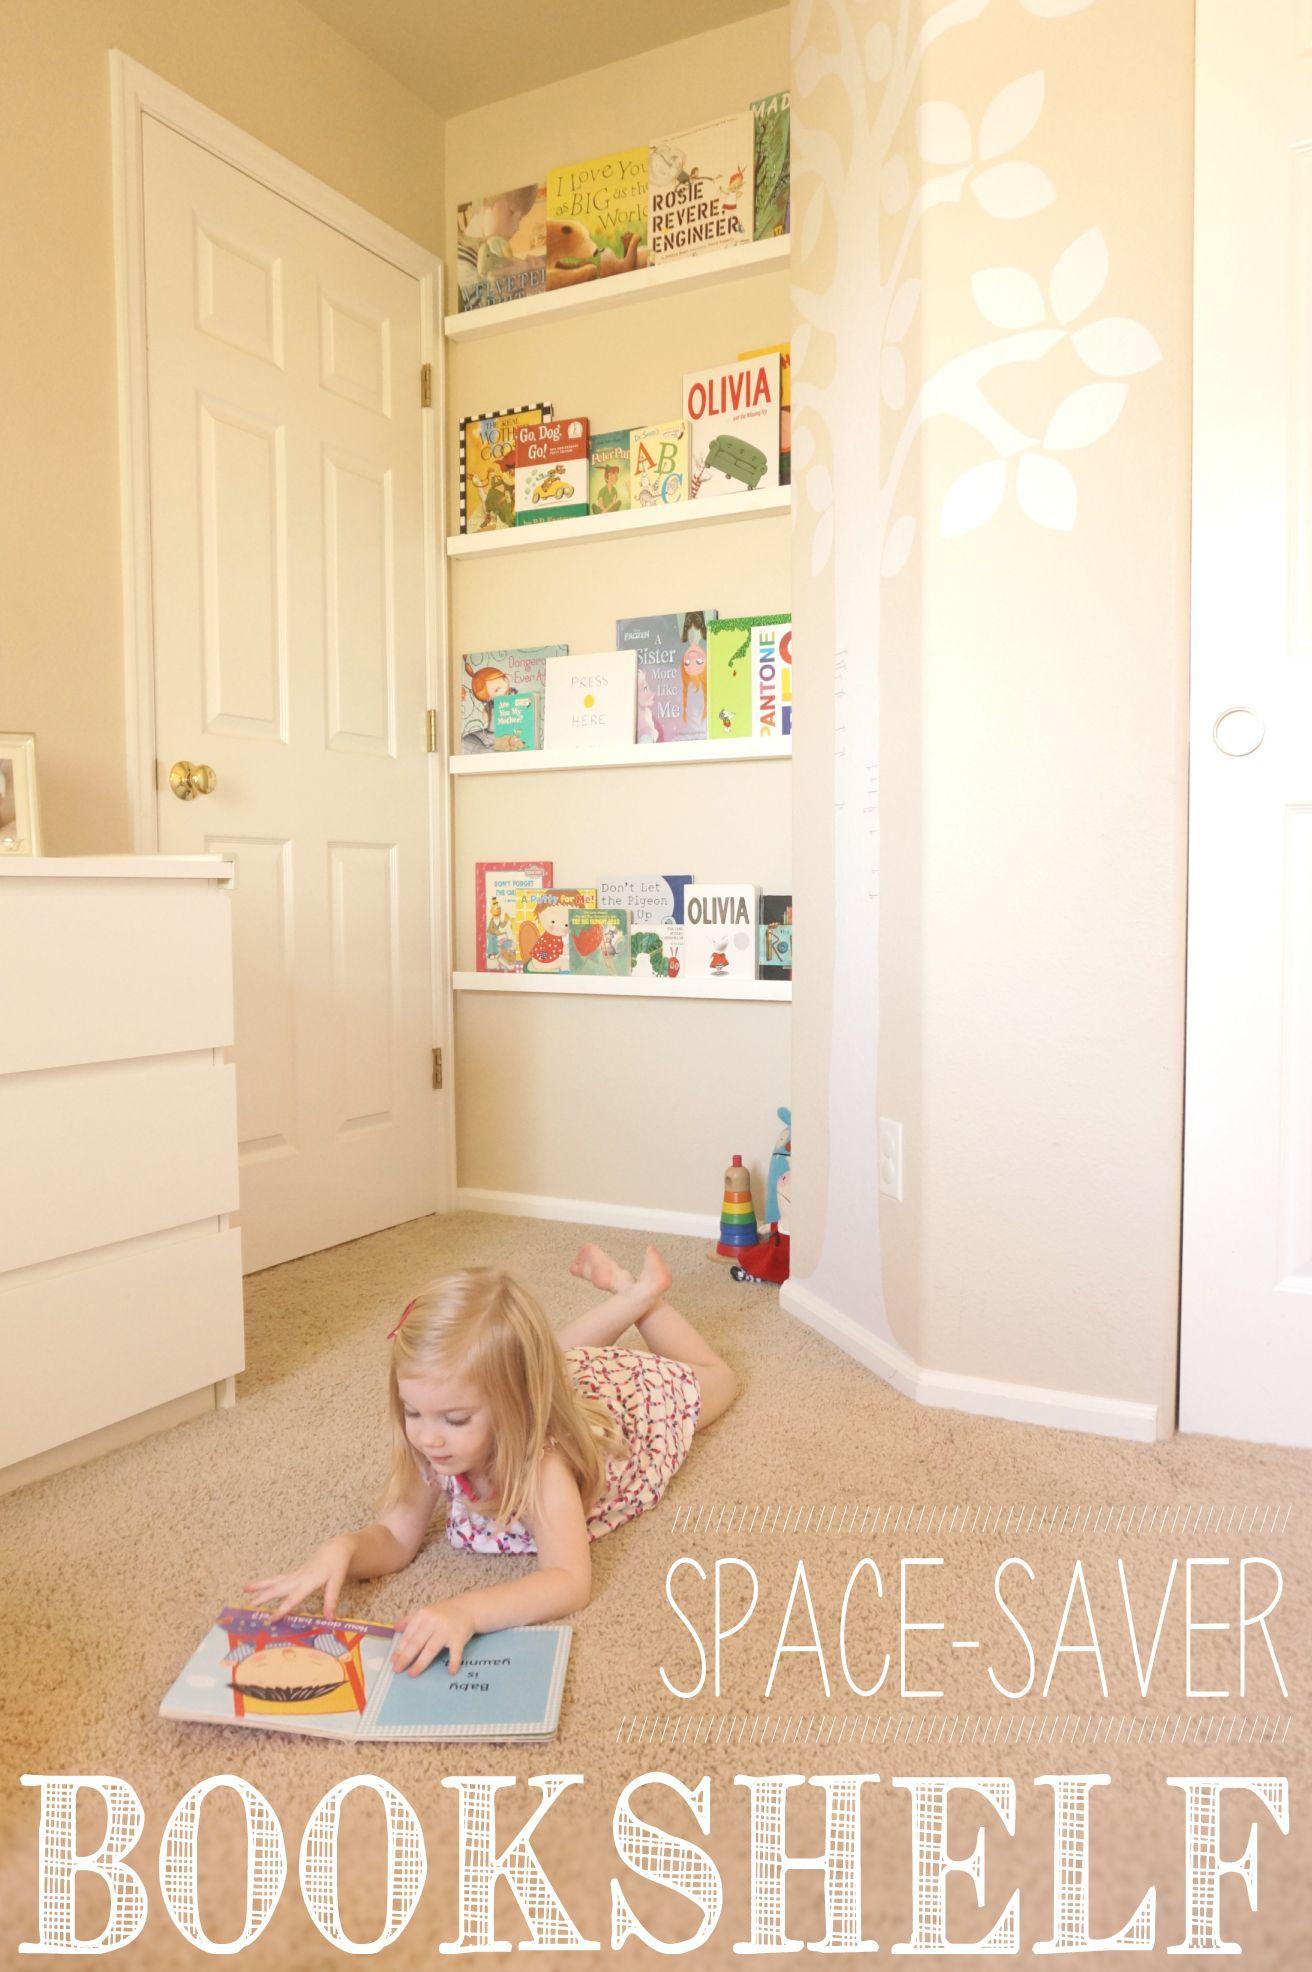 Diy space saver bookshelf for the home bookshelves - Bathroom door ideas for small spaces ...